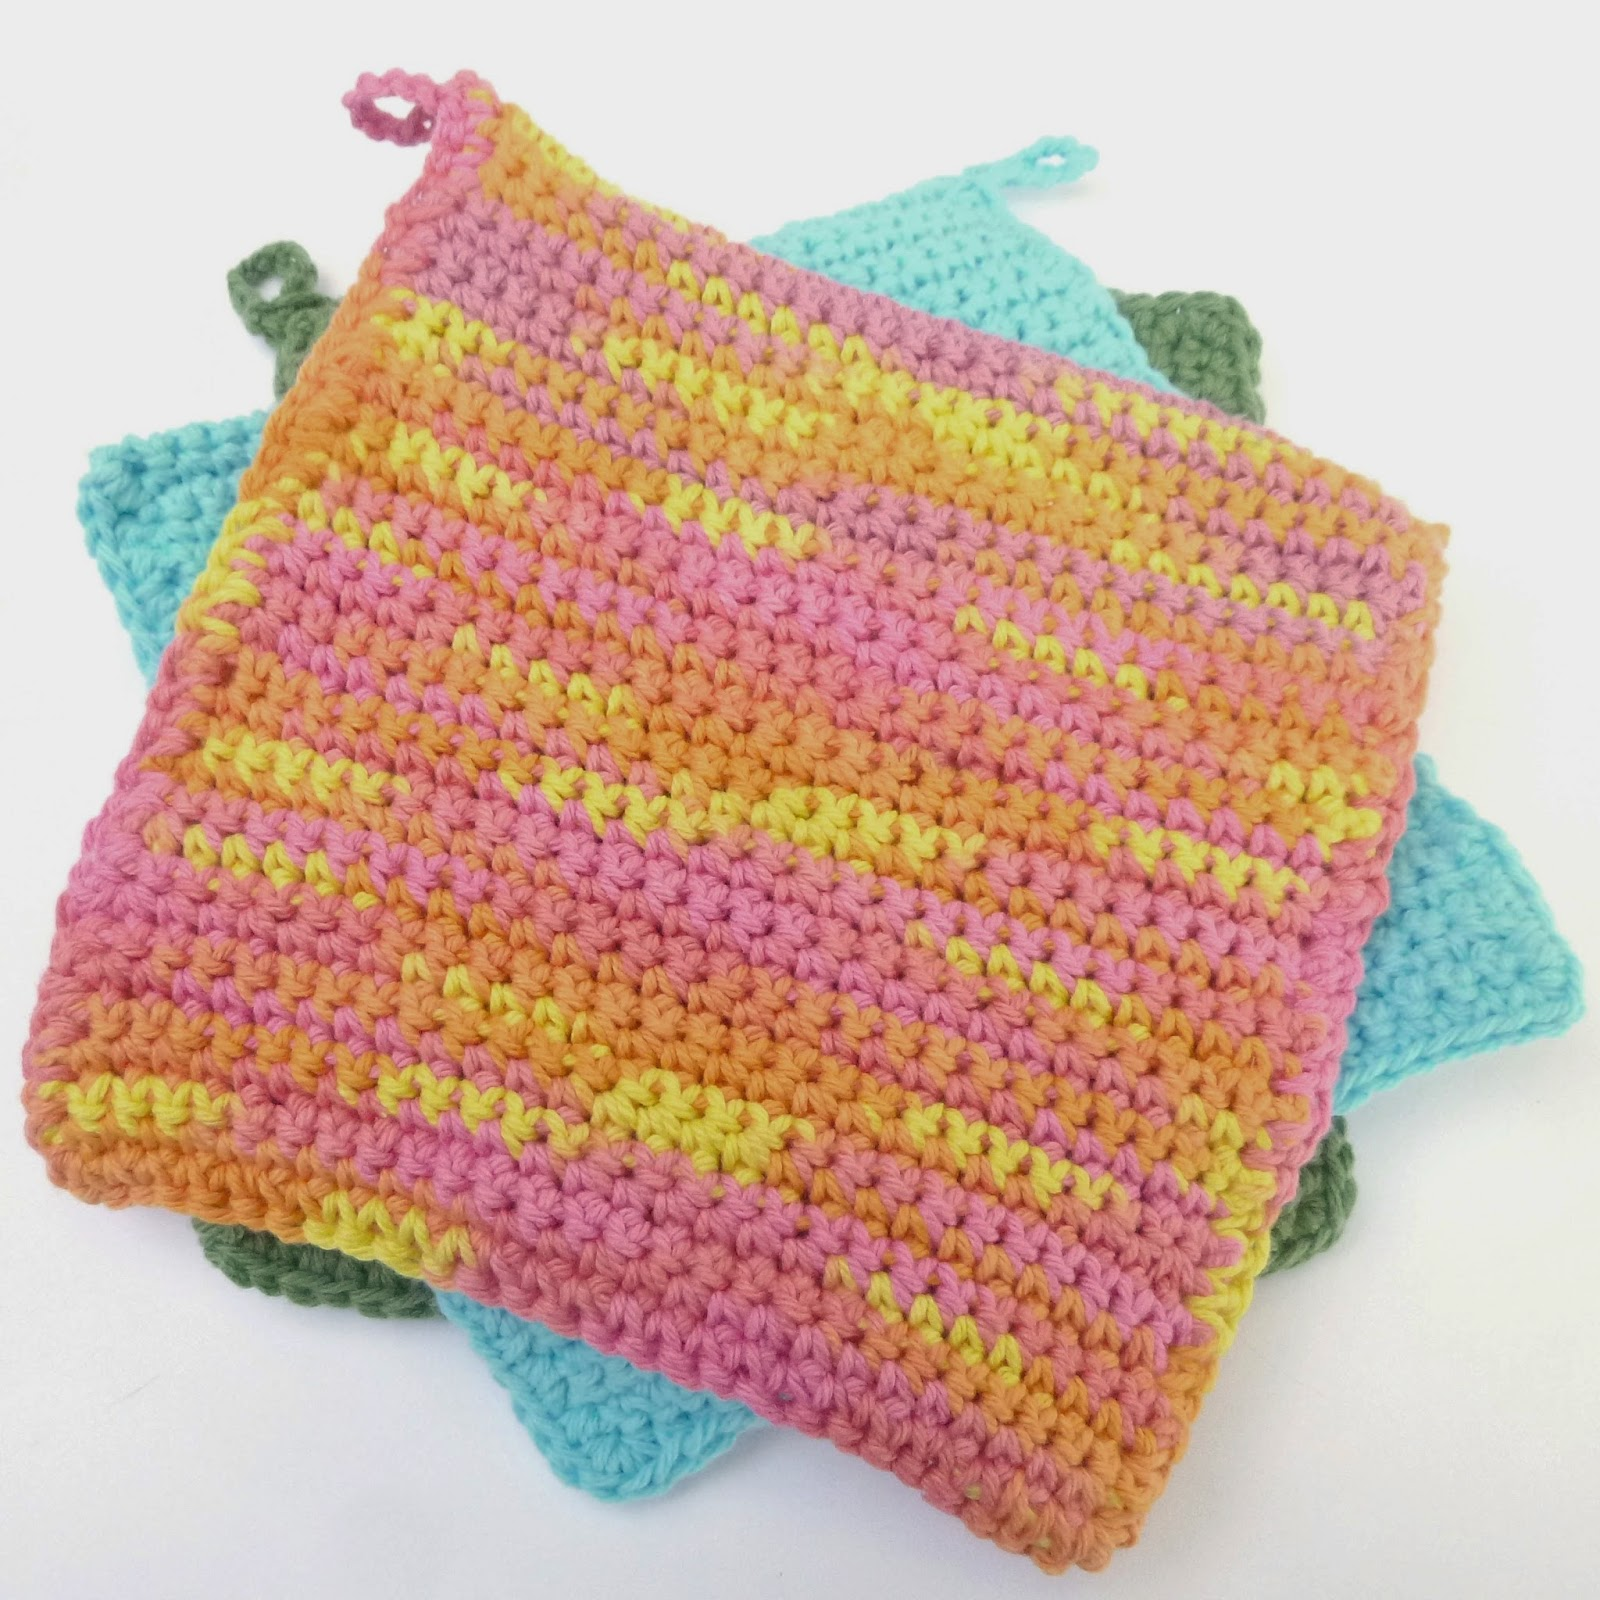 Wild Green Pastures: Basic Heavy Duty Potholder Crochet Pattern